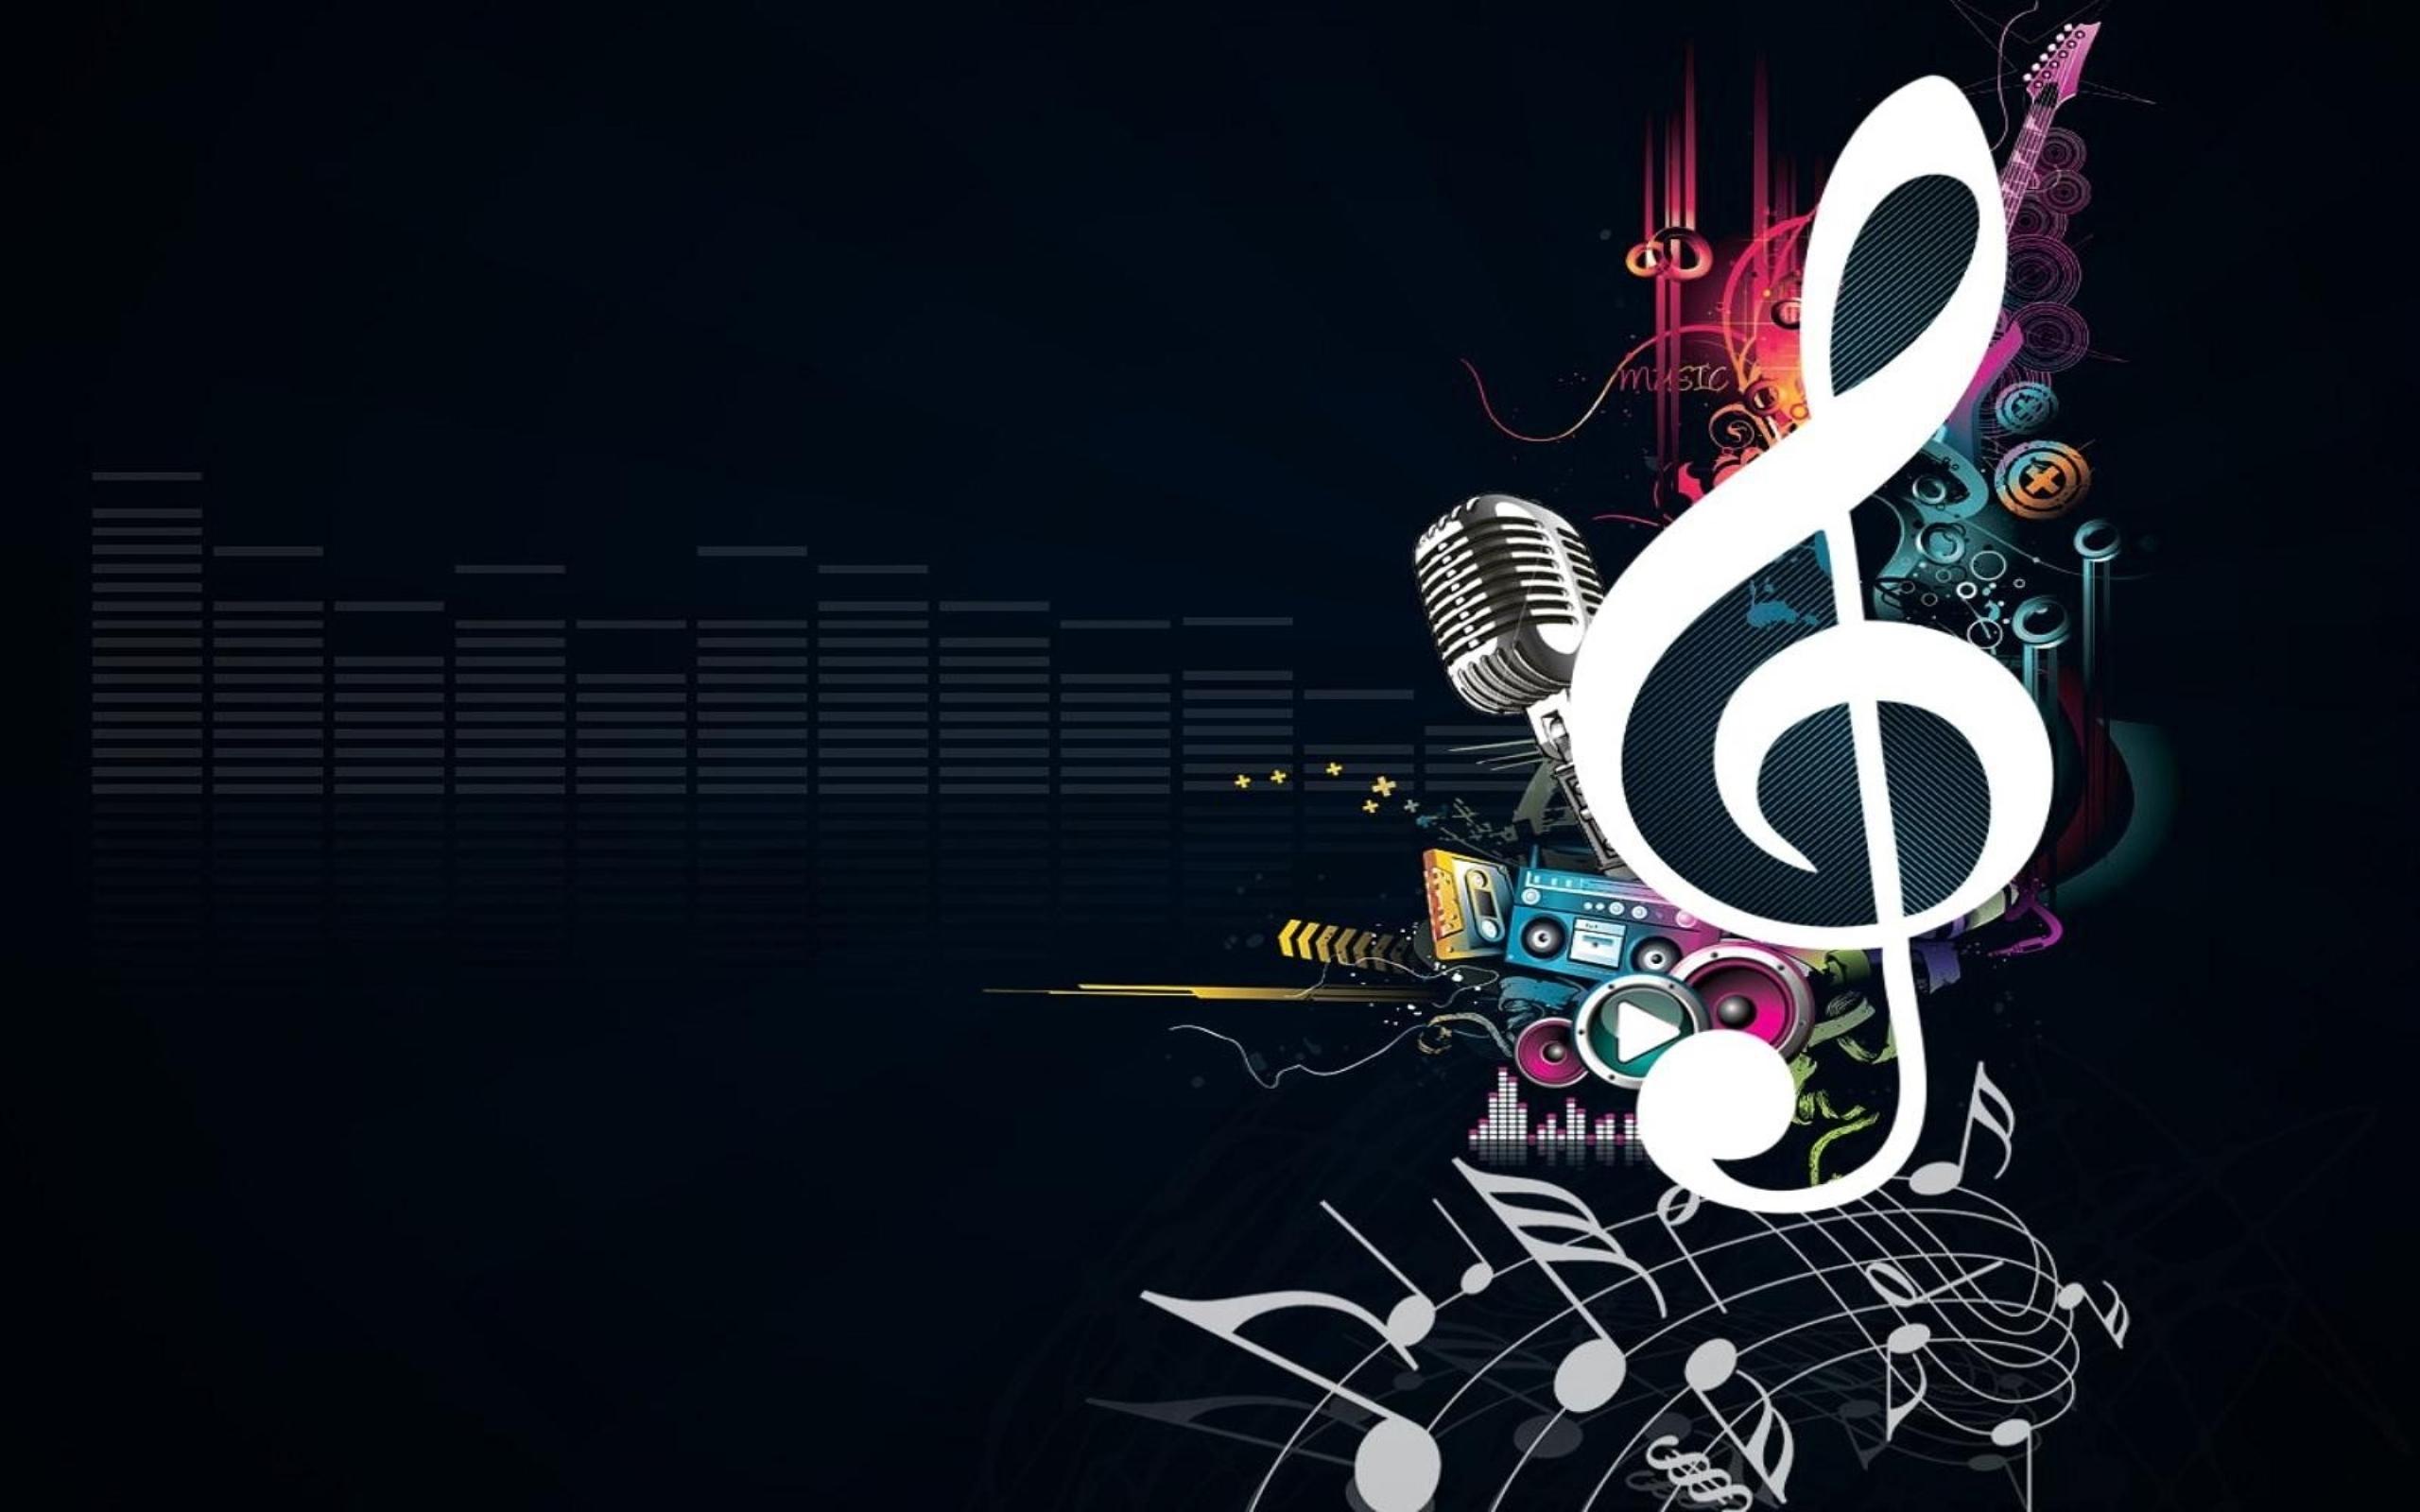 music-cool-art-background-wallpaper (2560×1600)   ปกเพลง